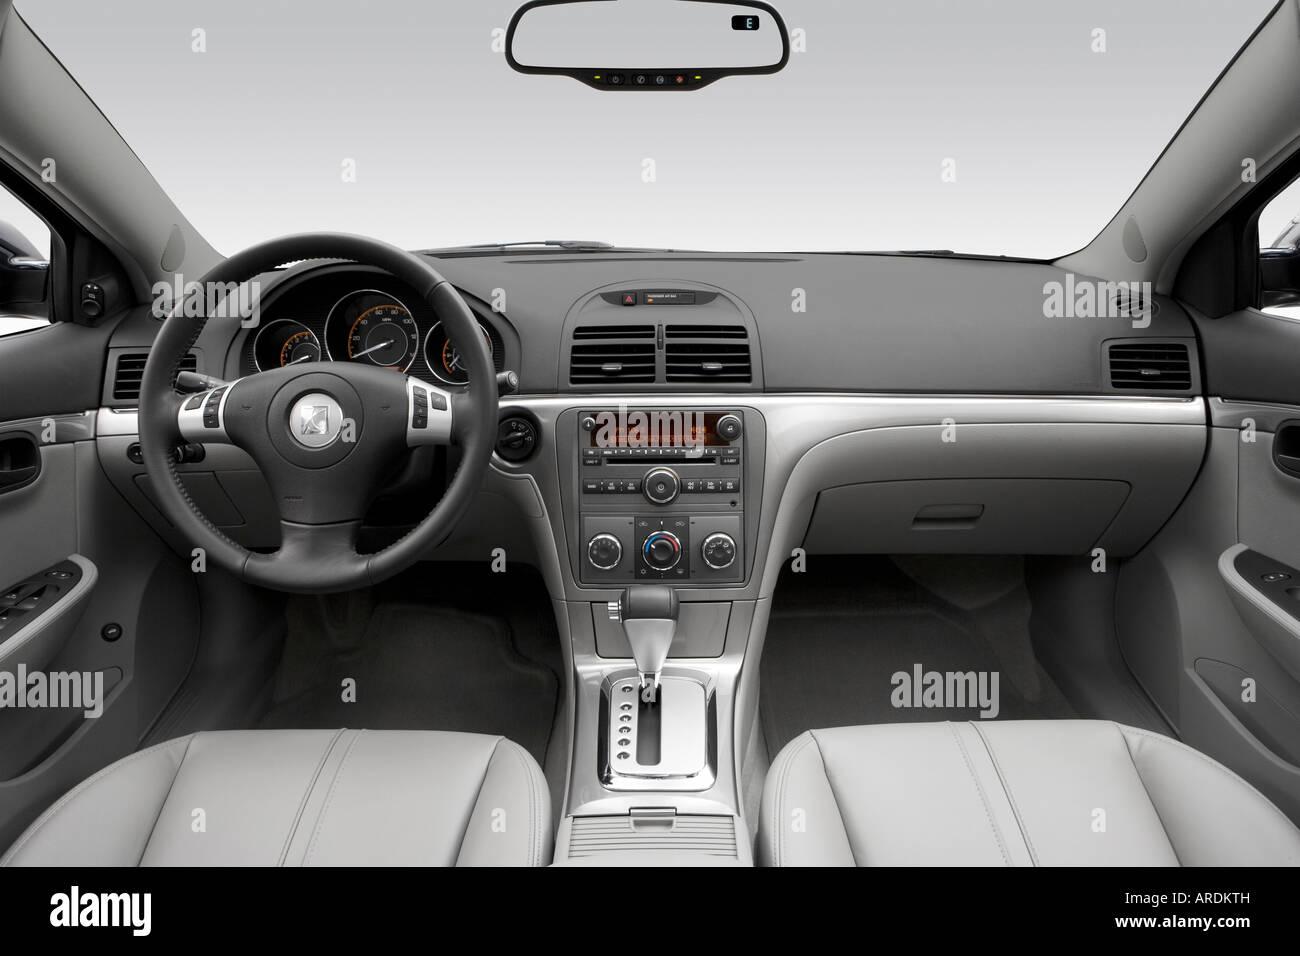 2007 saturn aura xe in blue dashboard center console gear shifter view